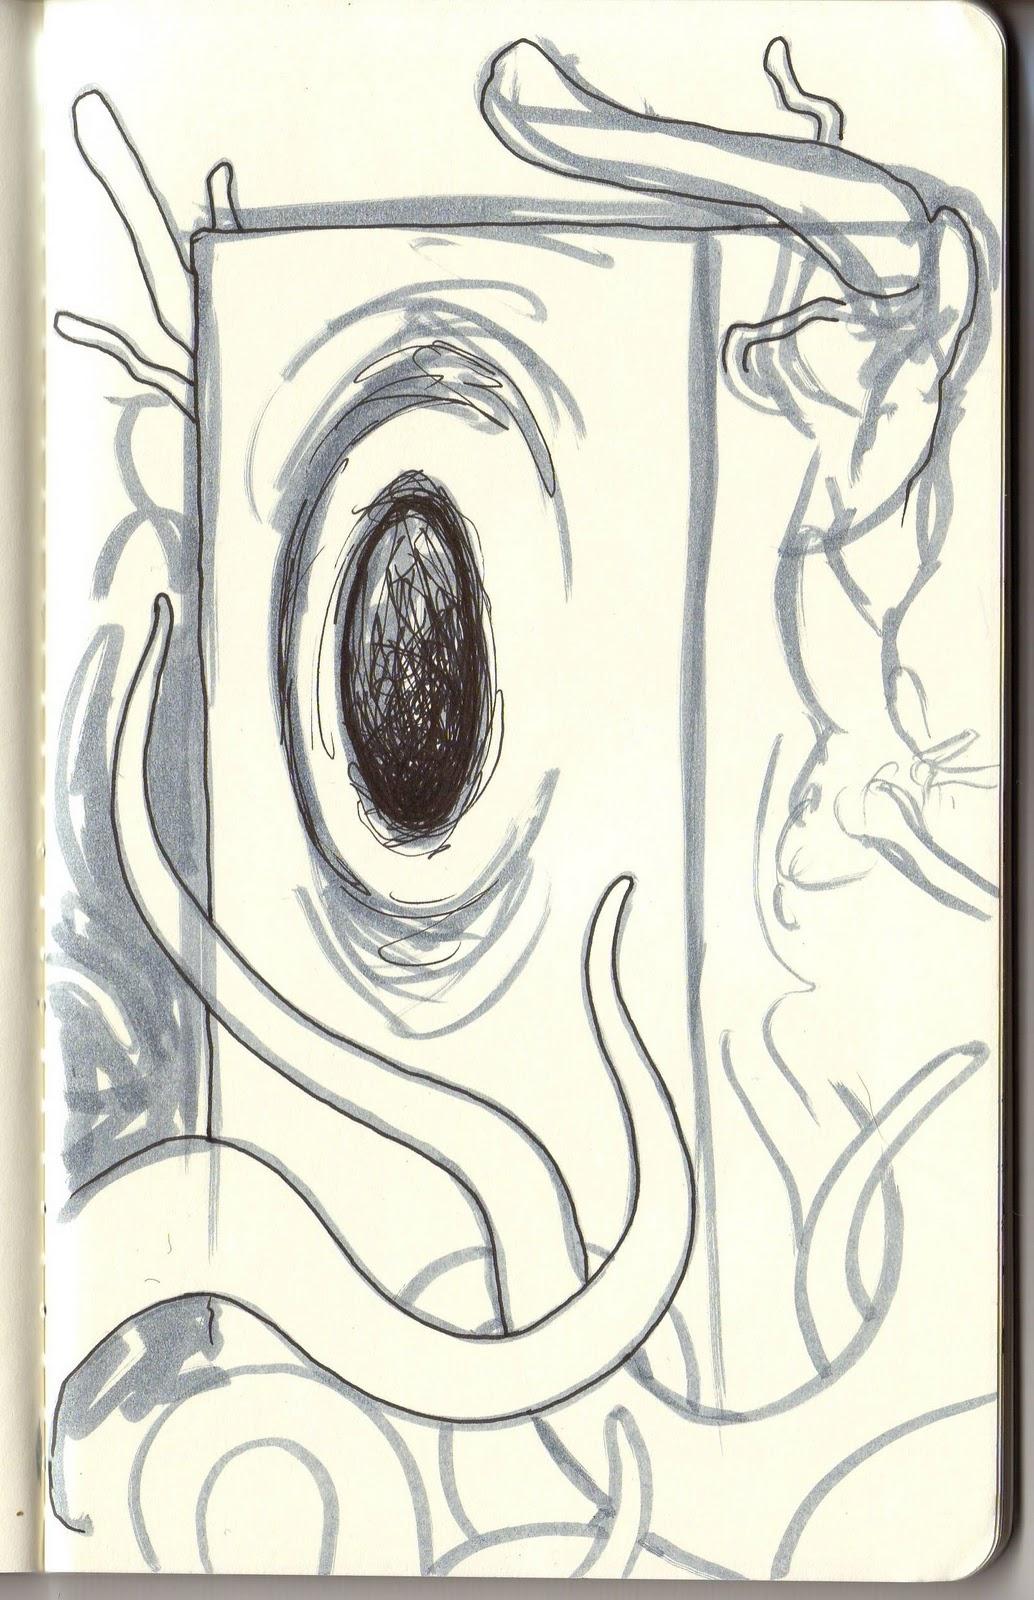 Art house co op sketchbook project